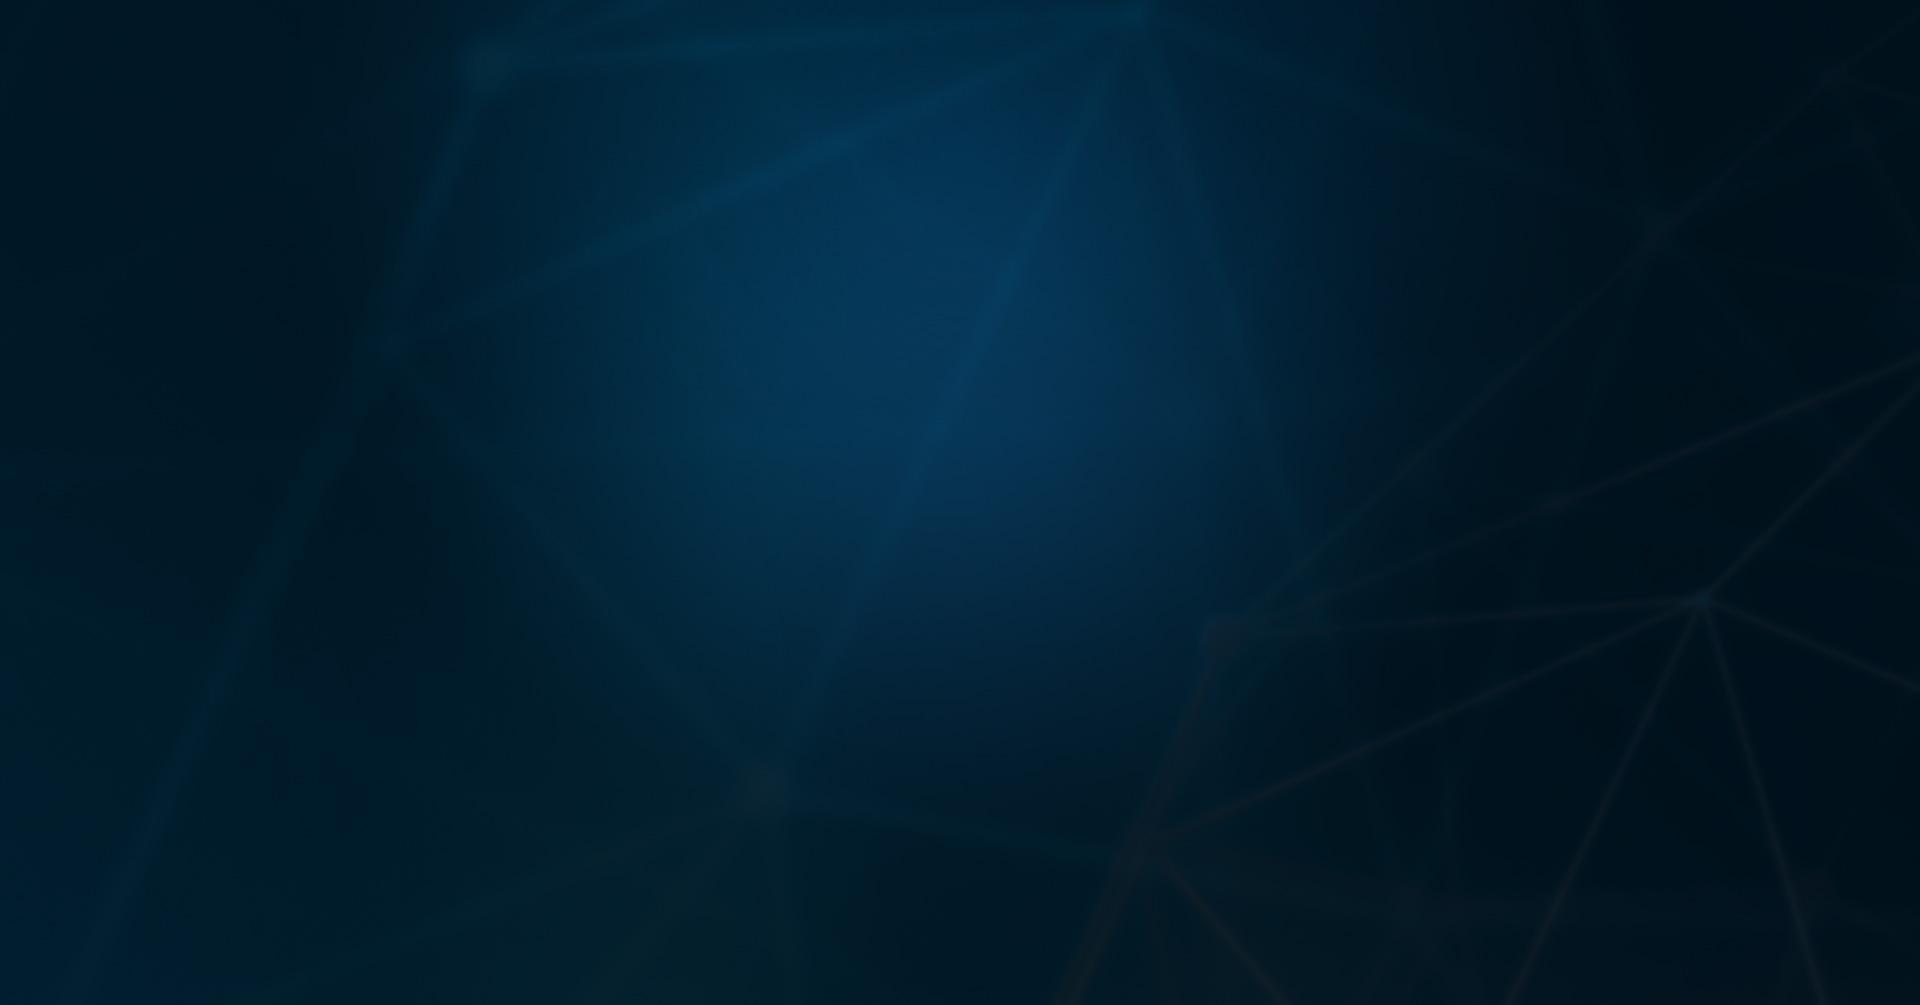 https://horizon.matra-electronique.com/wp-content/uploads/2020/11/backslide-5-1.jpg